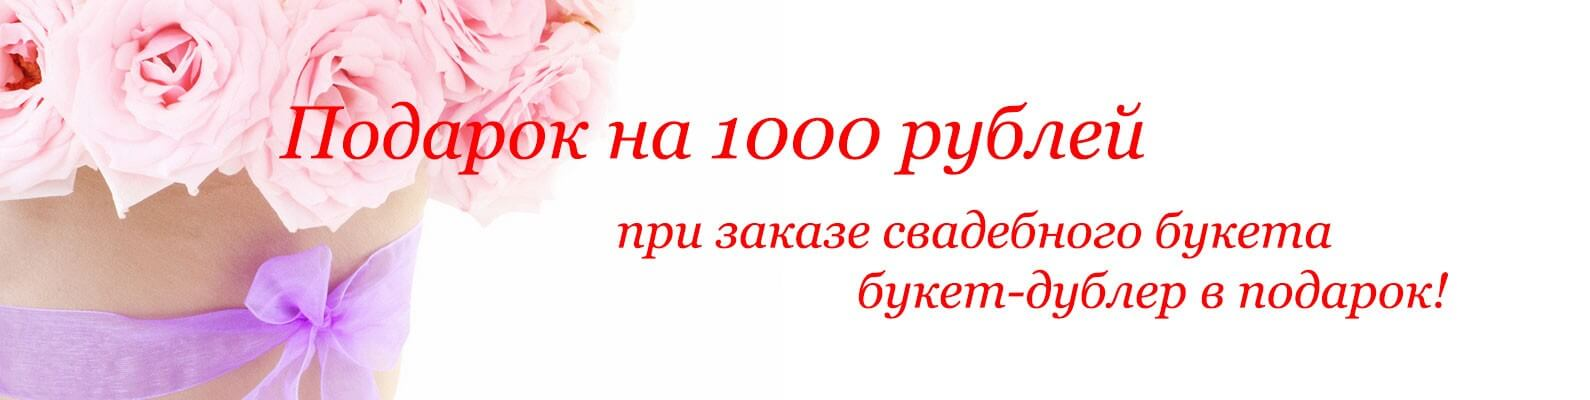 Камелия-Подарок на 1000 руб. пр заказе свадебного букета